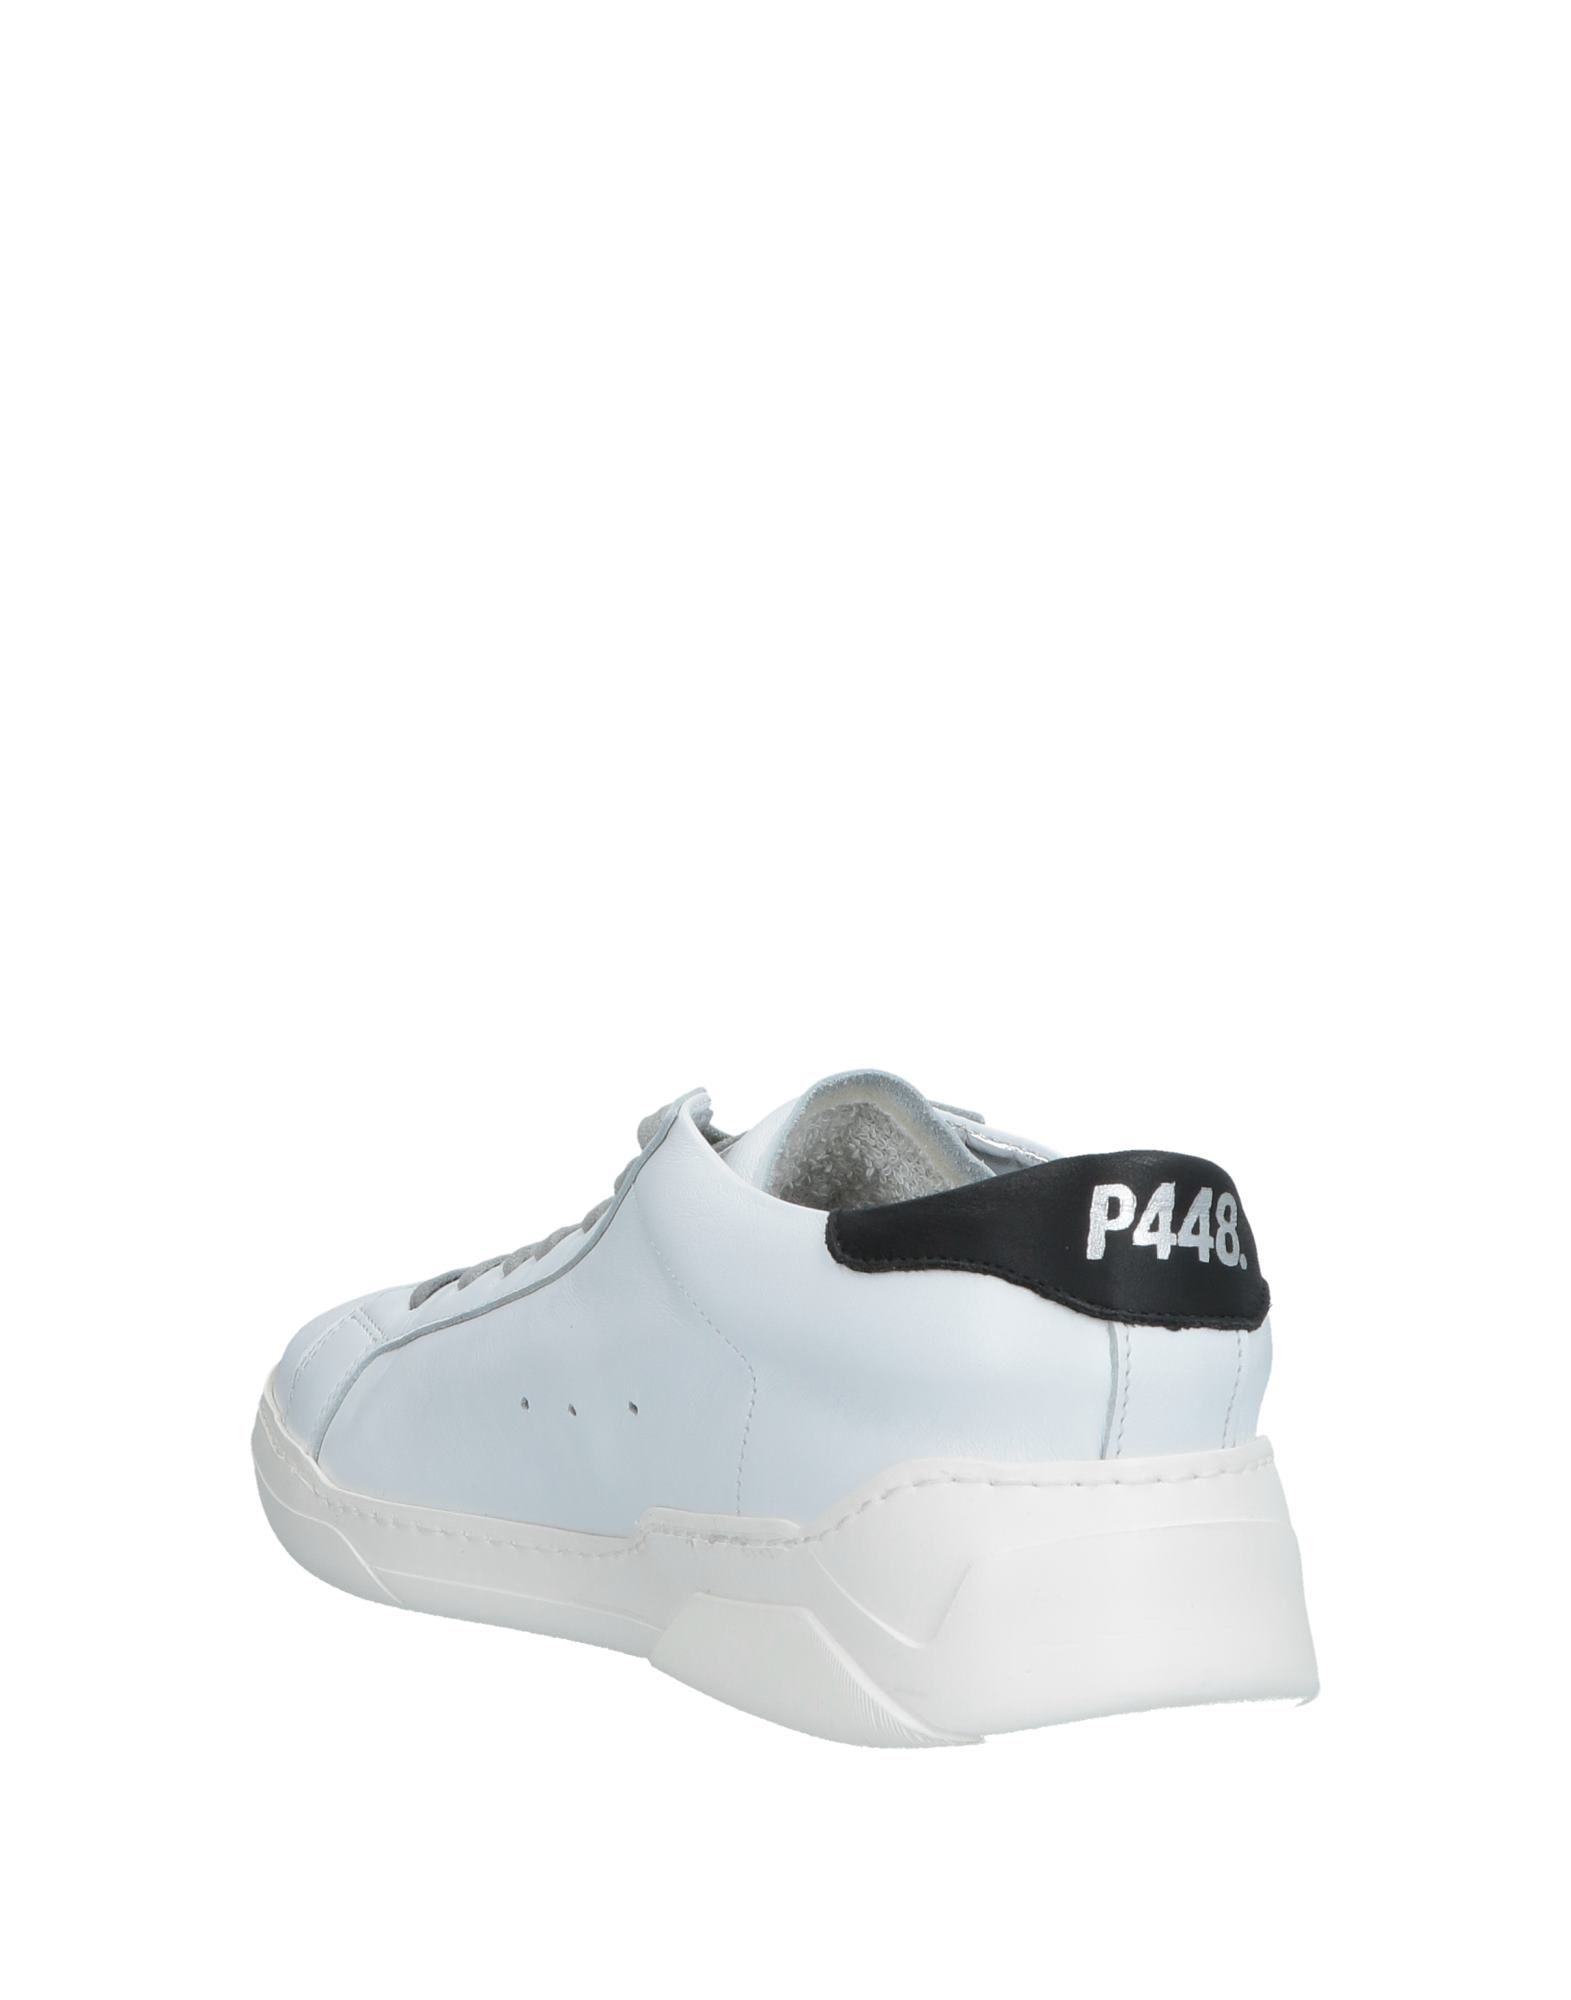 P448 Sneakers - - - Men P448 Sneakers online on  United Kingdom - 11573173JO 4689d6